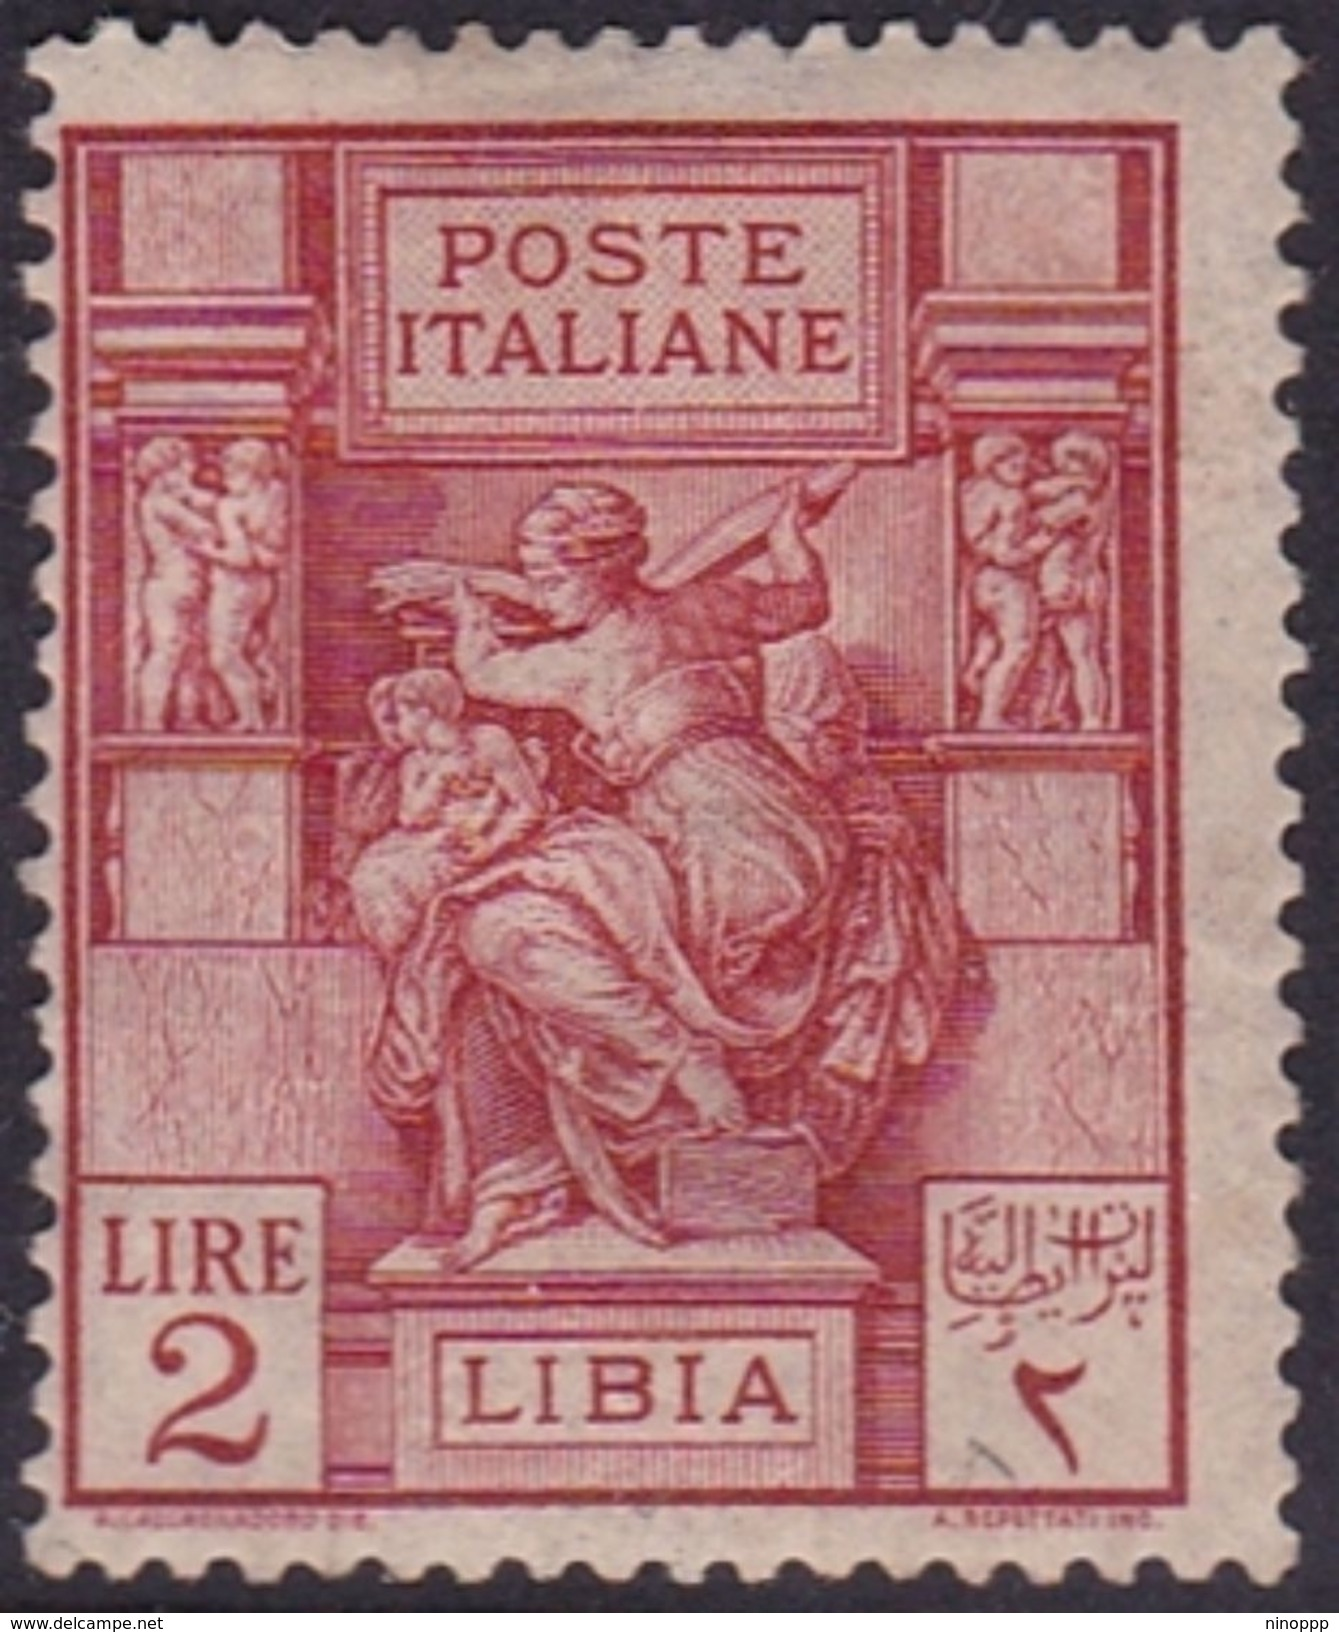 Italy-Colonies And Territories-Libya S 43 1924 ,Libyan Sibyl,2 Lire Carmine,mint Hinged - Libya